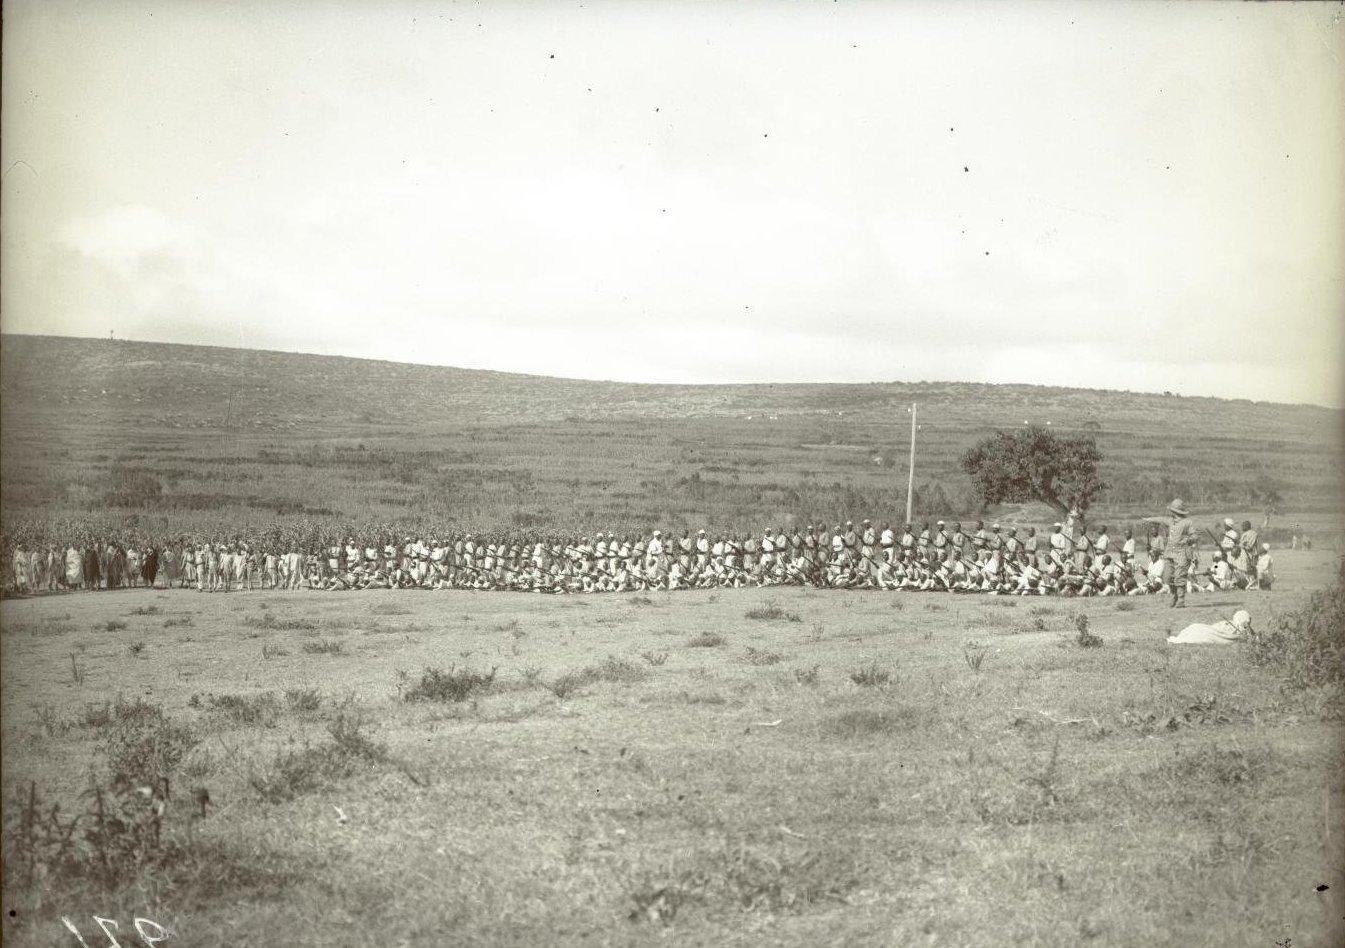 271. Абиссиния, провинция Харар, г. Харар. Солдаты-шанкала